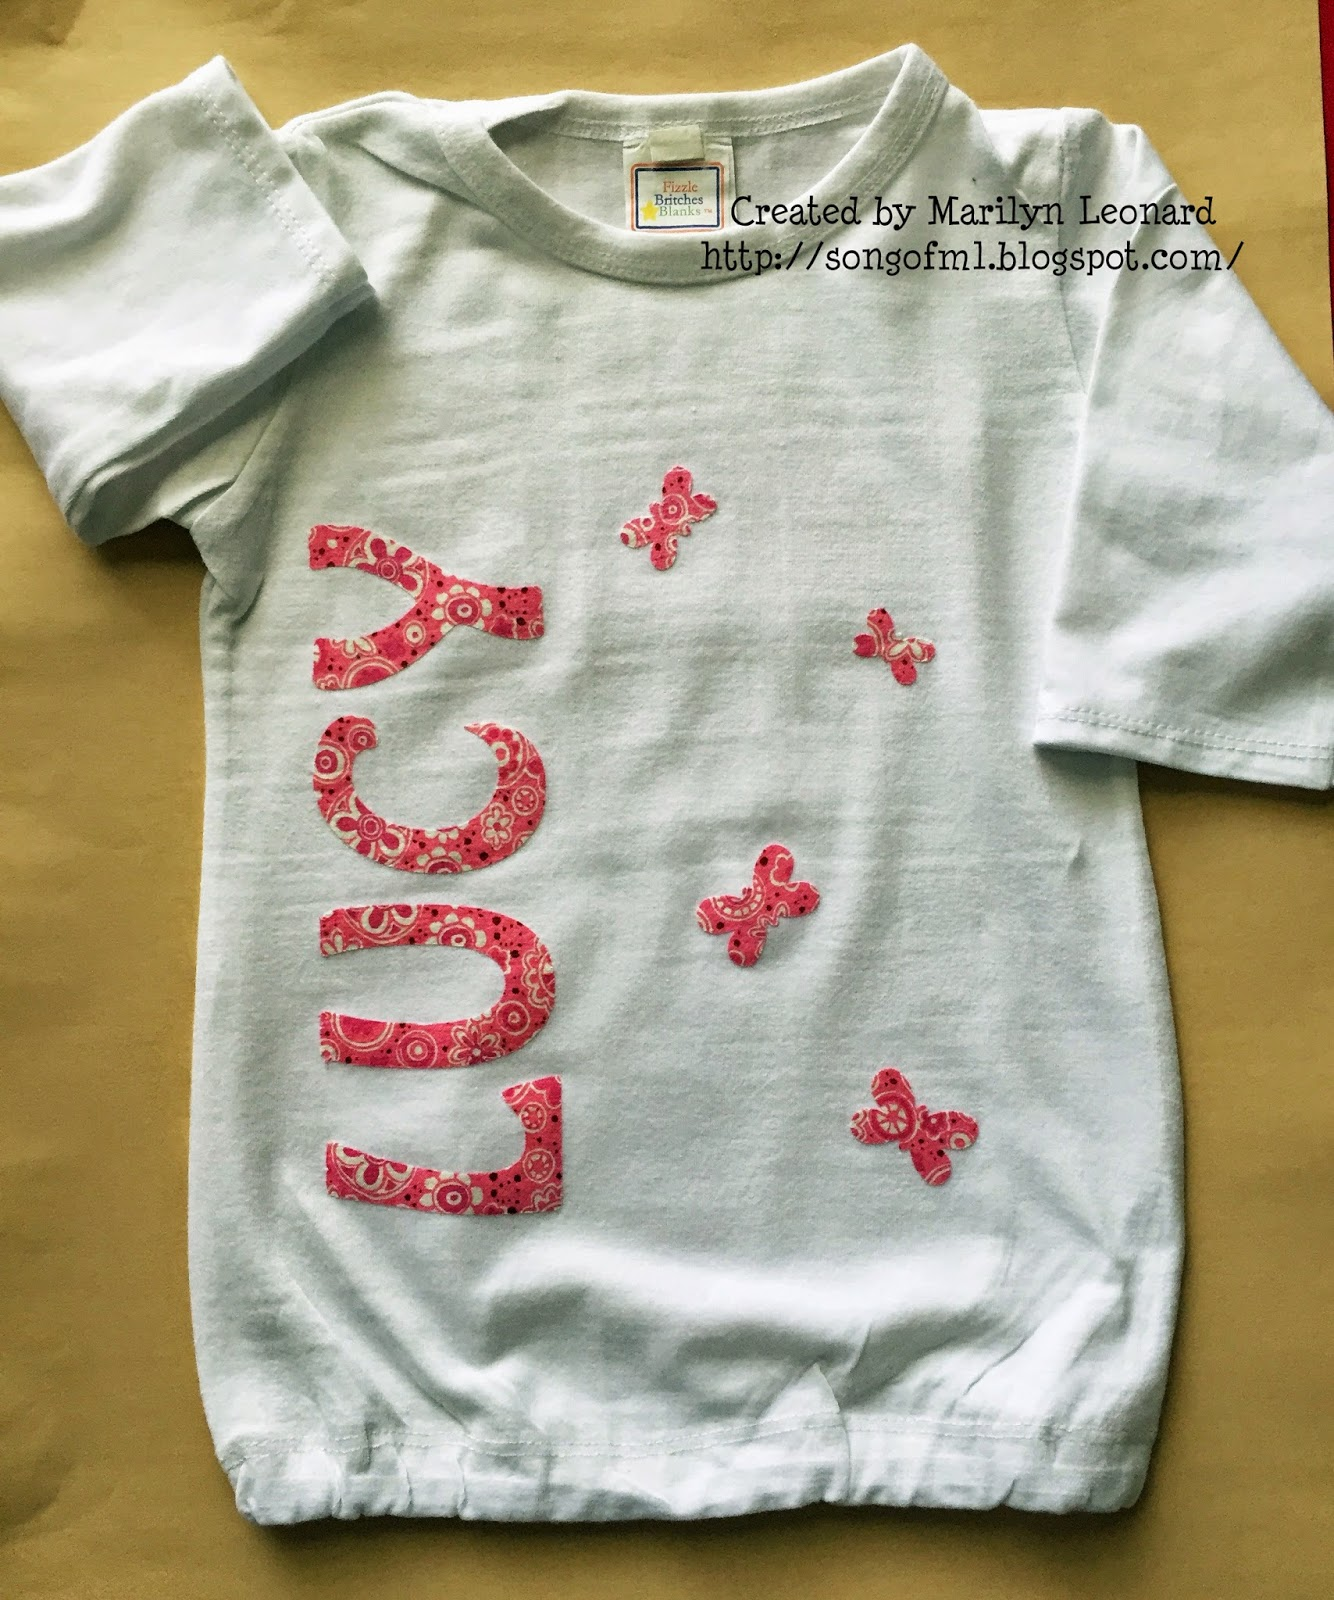 http://2.bp.blogspot.com/-r6vQsuIyBwM/VPD2OxY8EHI/AAAAAAAAHcg/0zHayZVnG4c/s1600/Watermark_Fabric_Cut_5.JPG